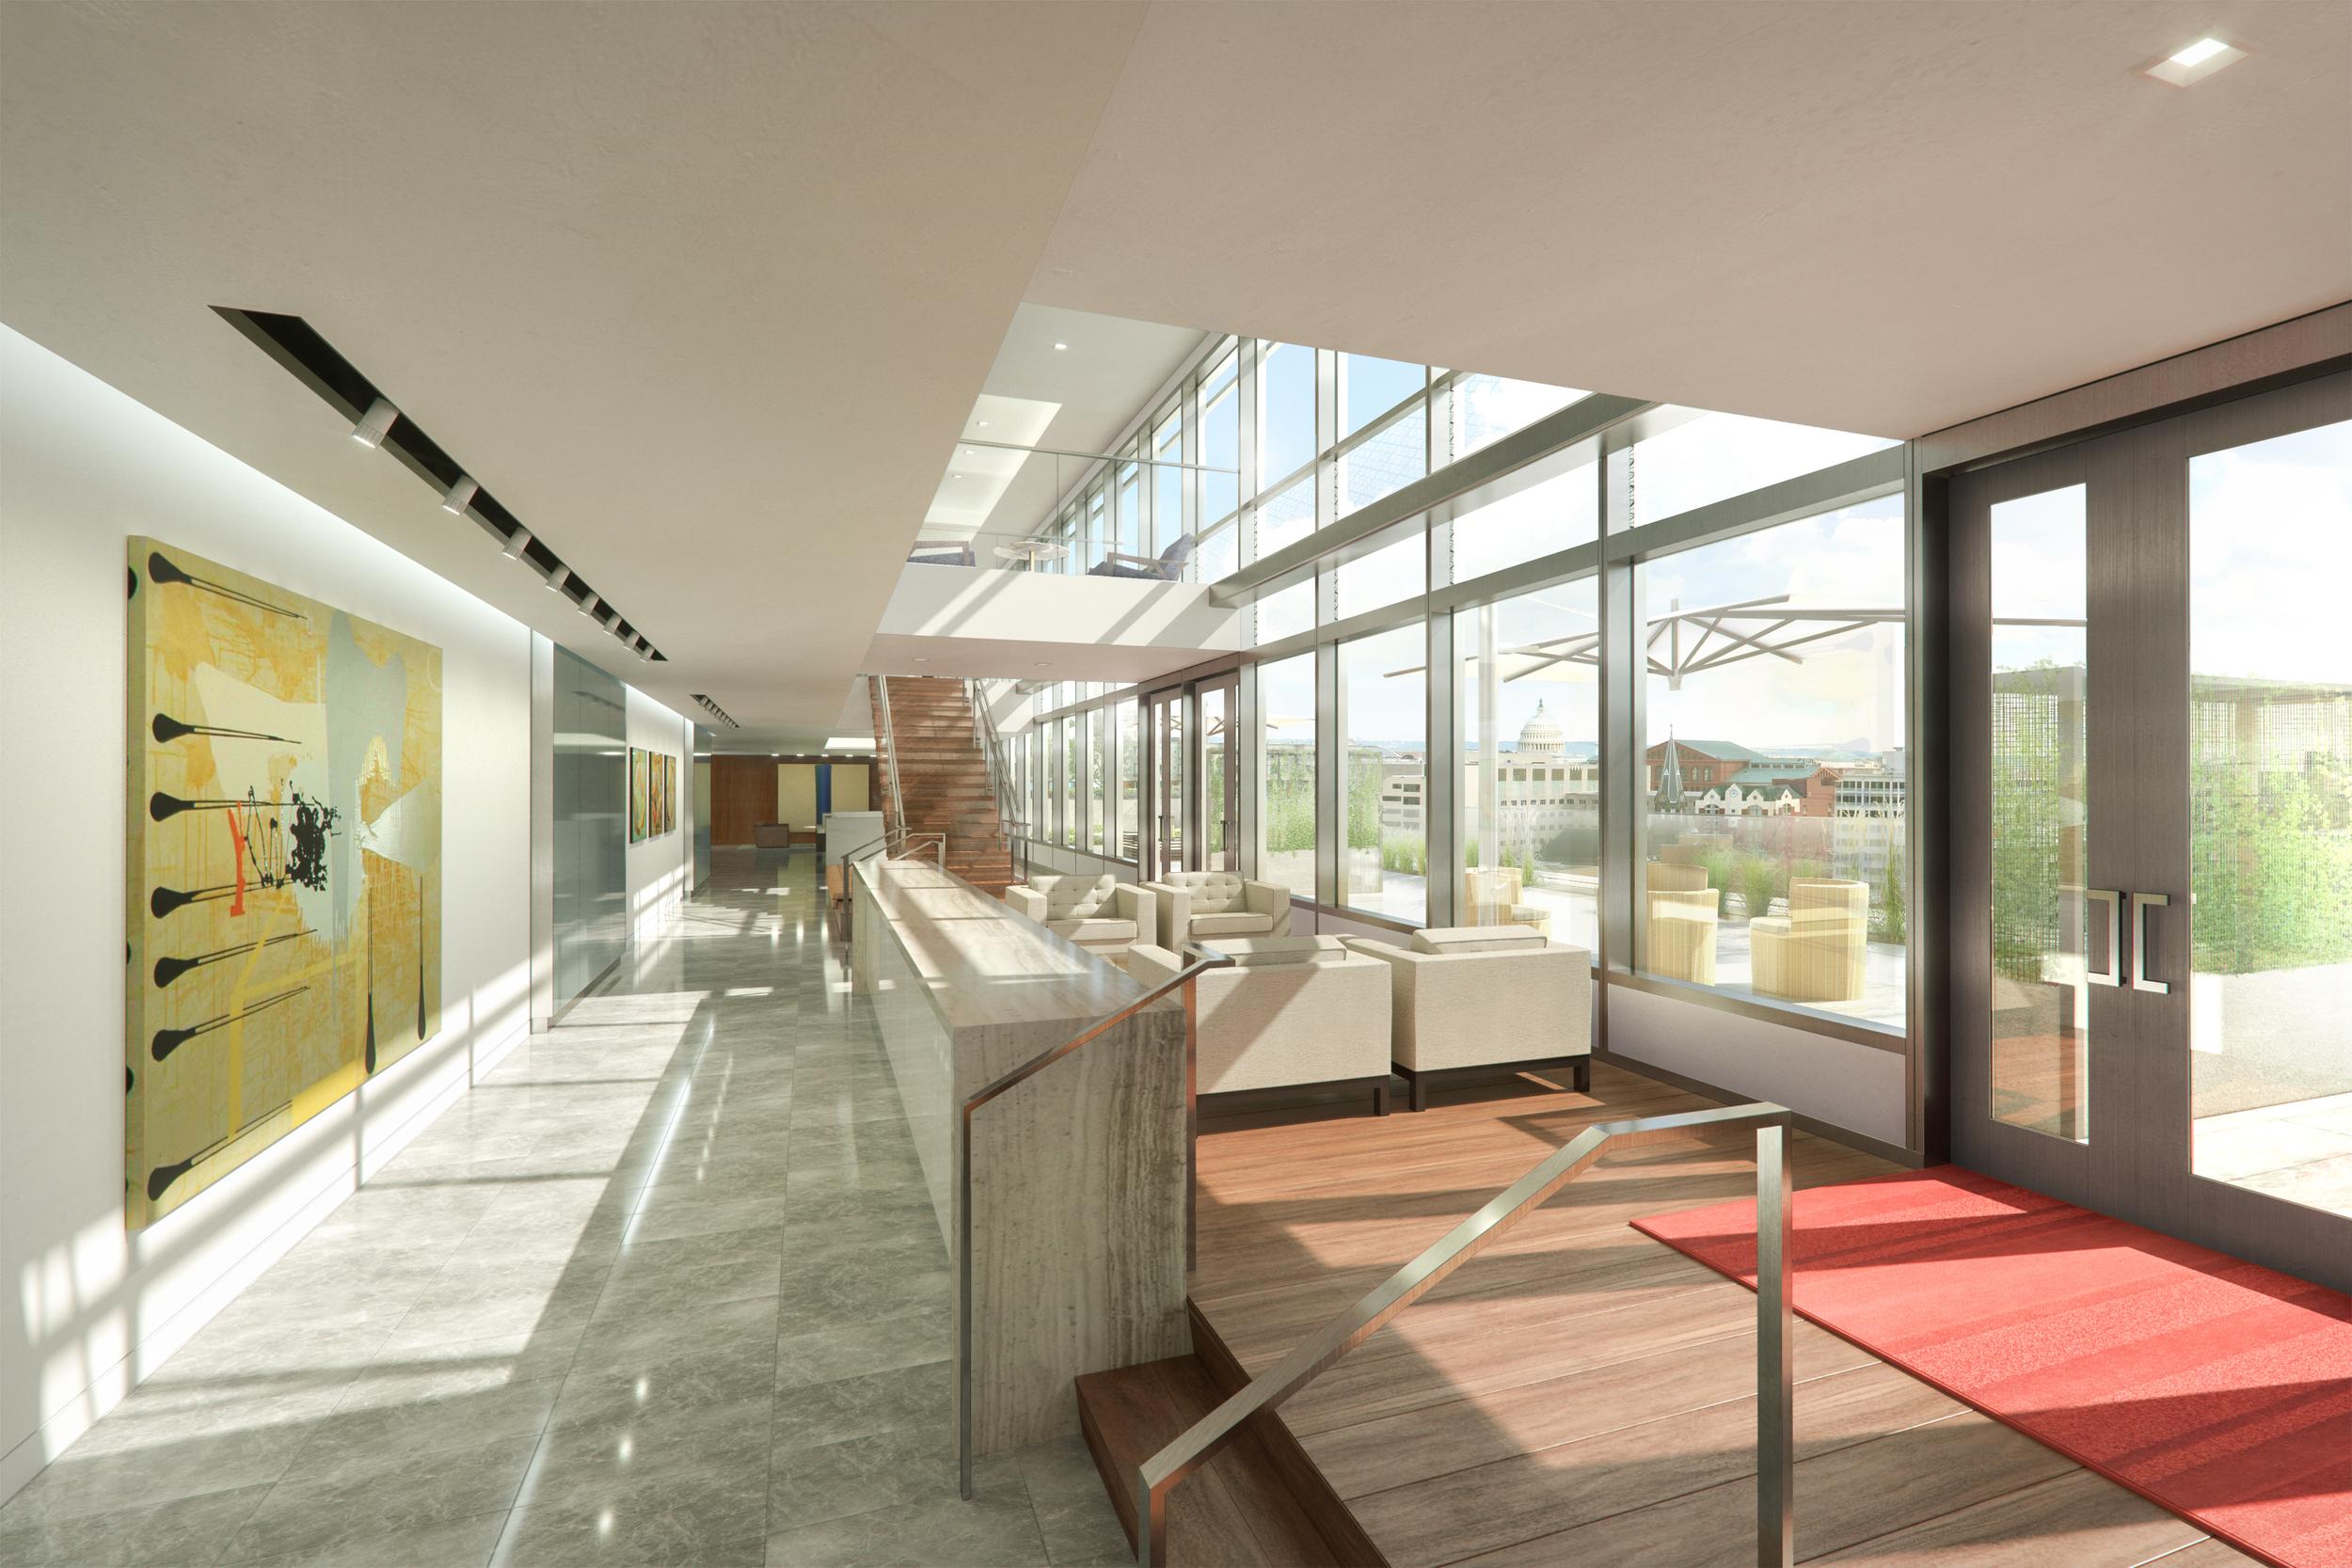 OFFICE LOBBY SPACE  Washington, DC | Client: HYL Architecture